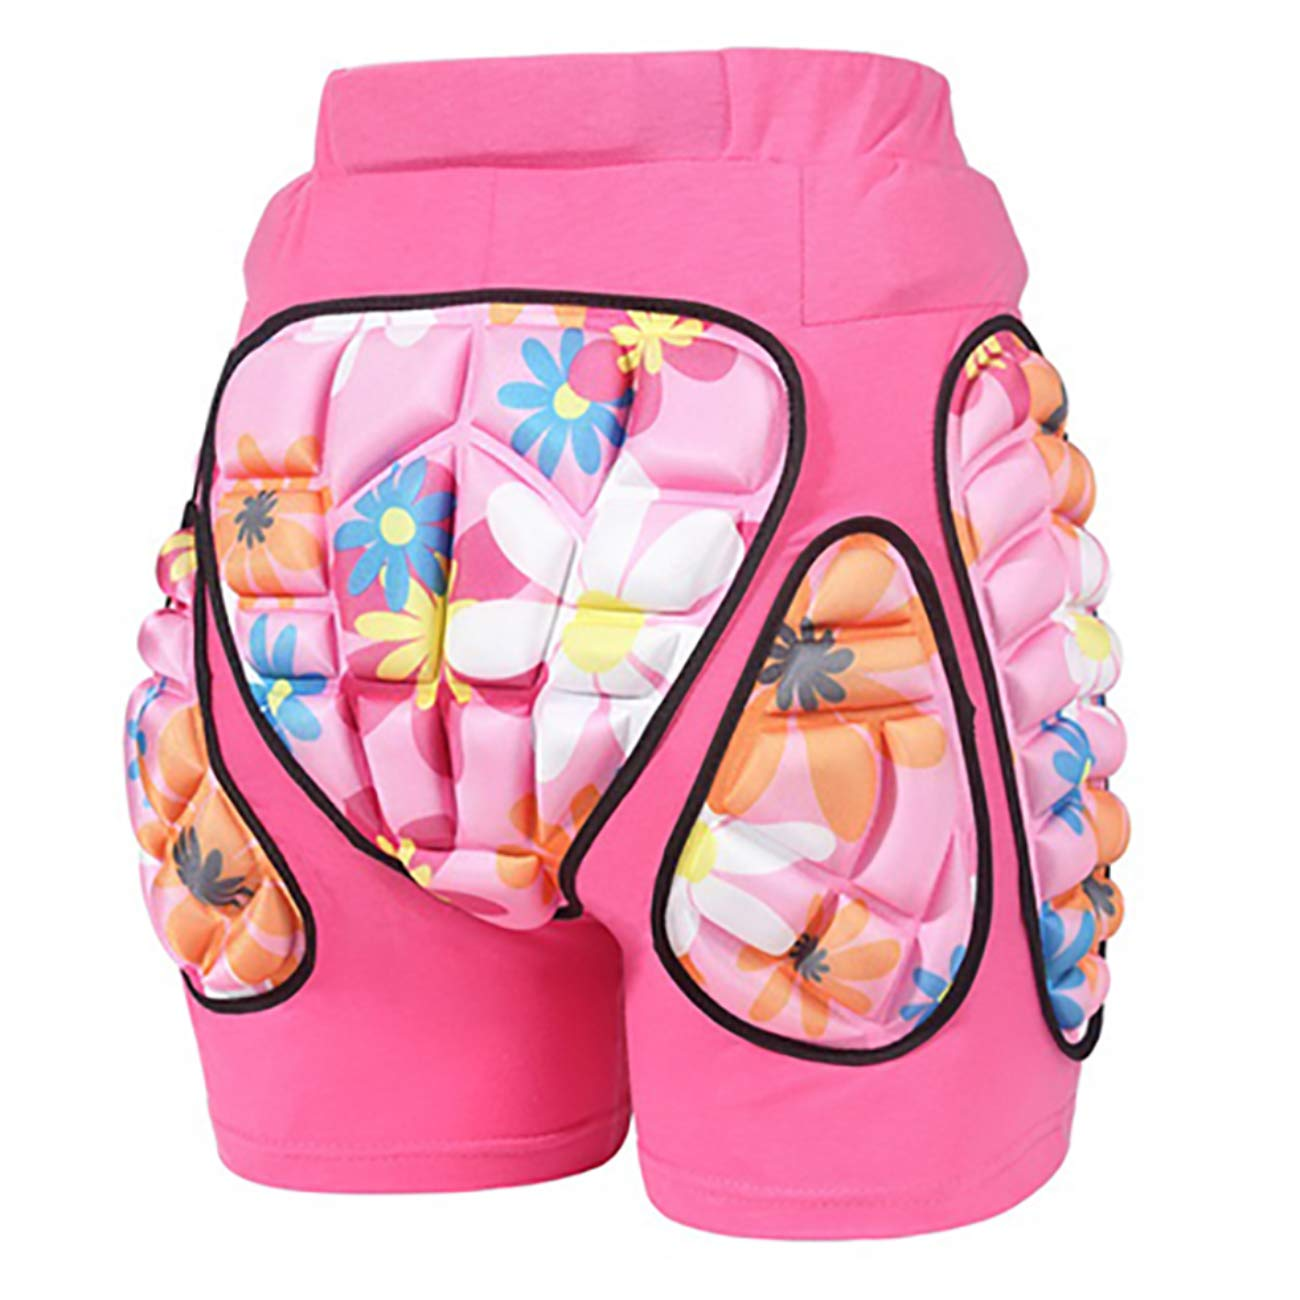 JMsDream 3D Padded Protection Hip EVA Short Pants Protective Gear for Kids & Adults Skating Riding Roller by JMsDream